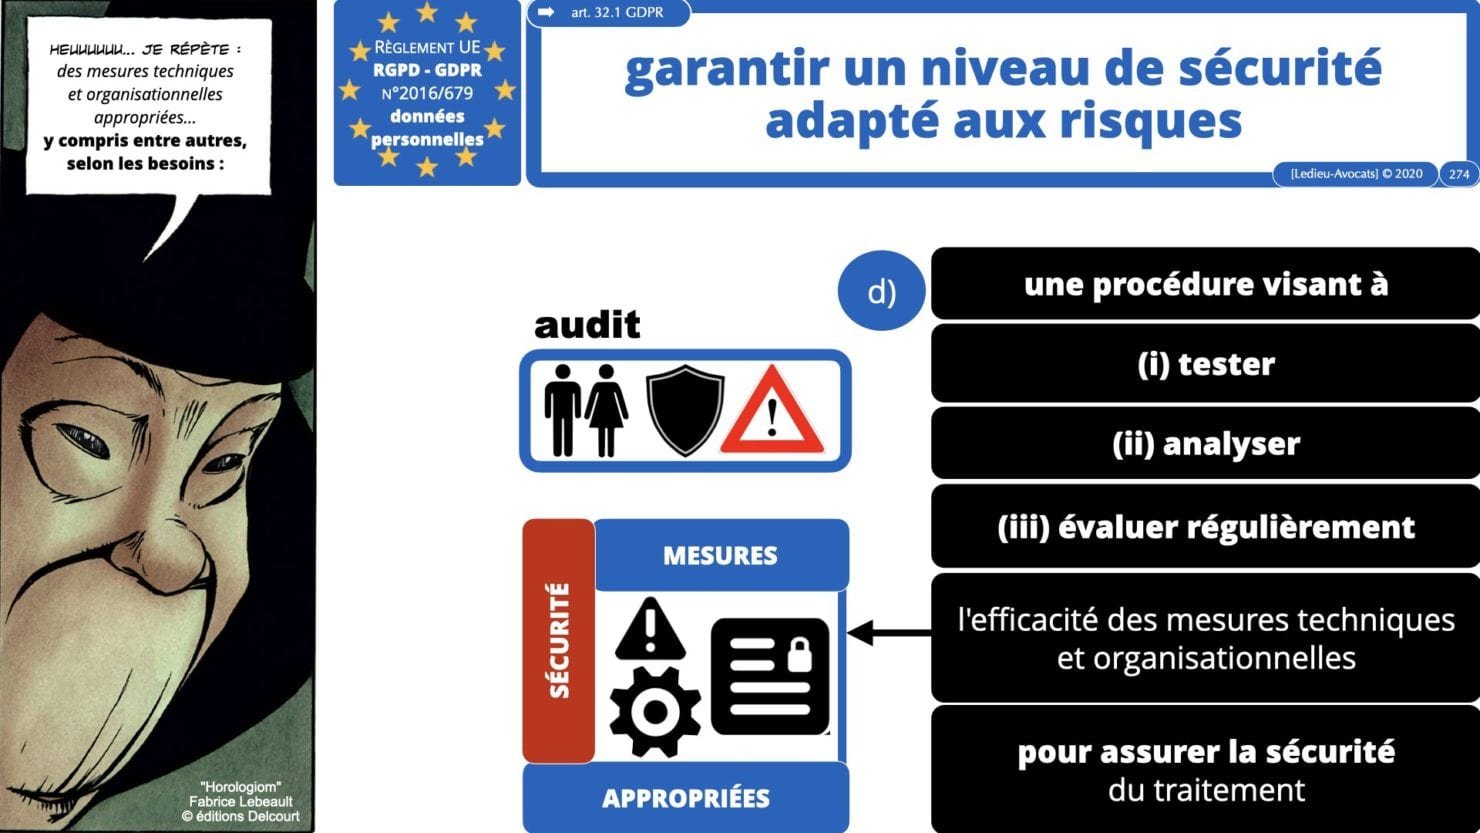 RGPD e-Privacy principes actualité jurisprudence ©Ledieu-Avocats 25-06-2021.274